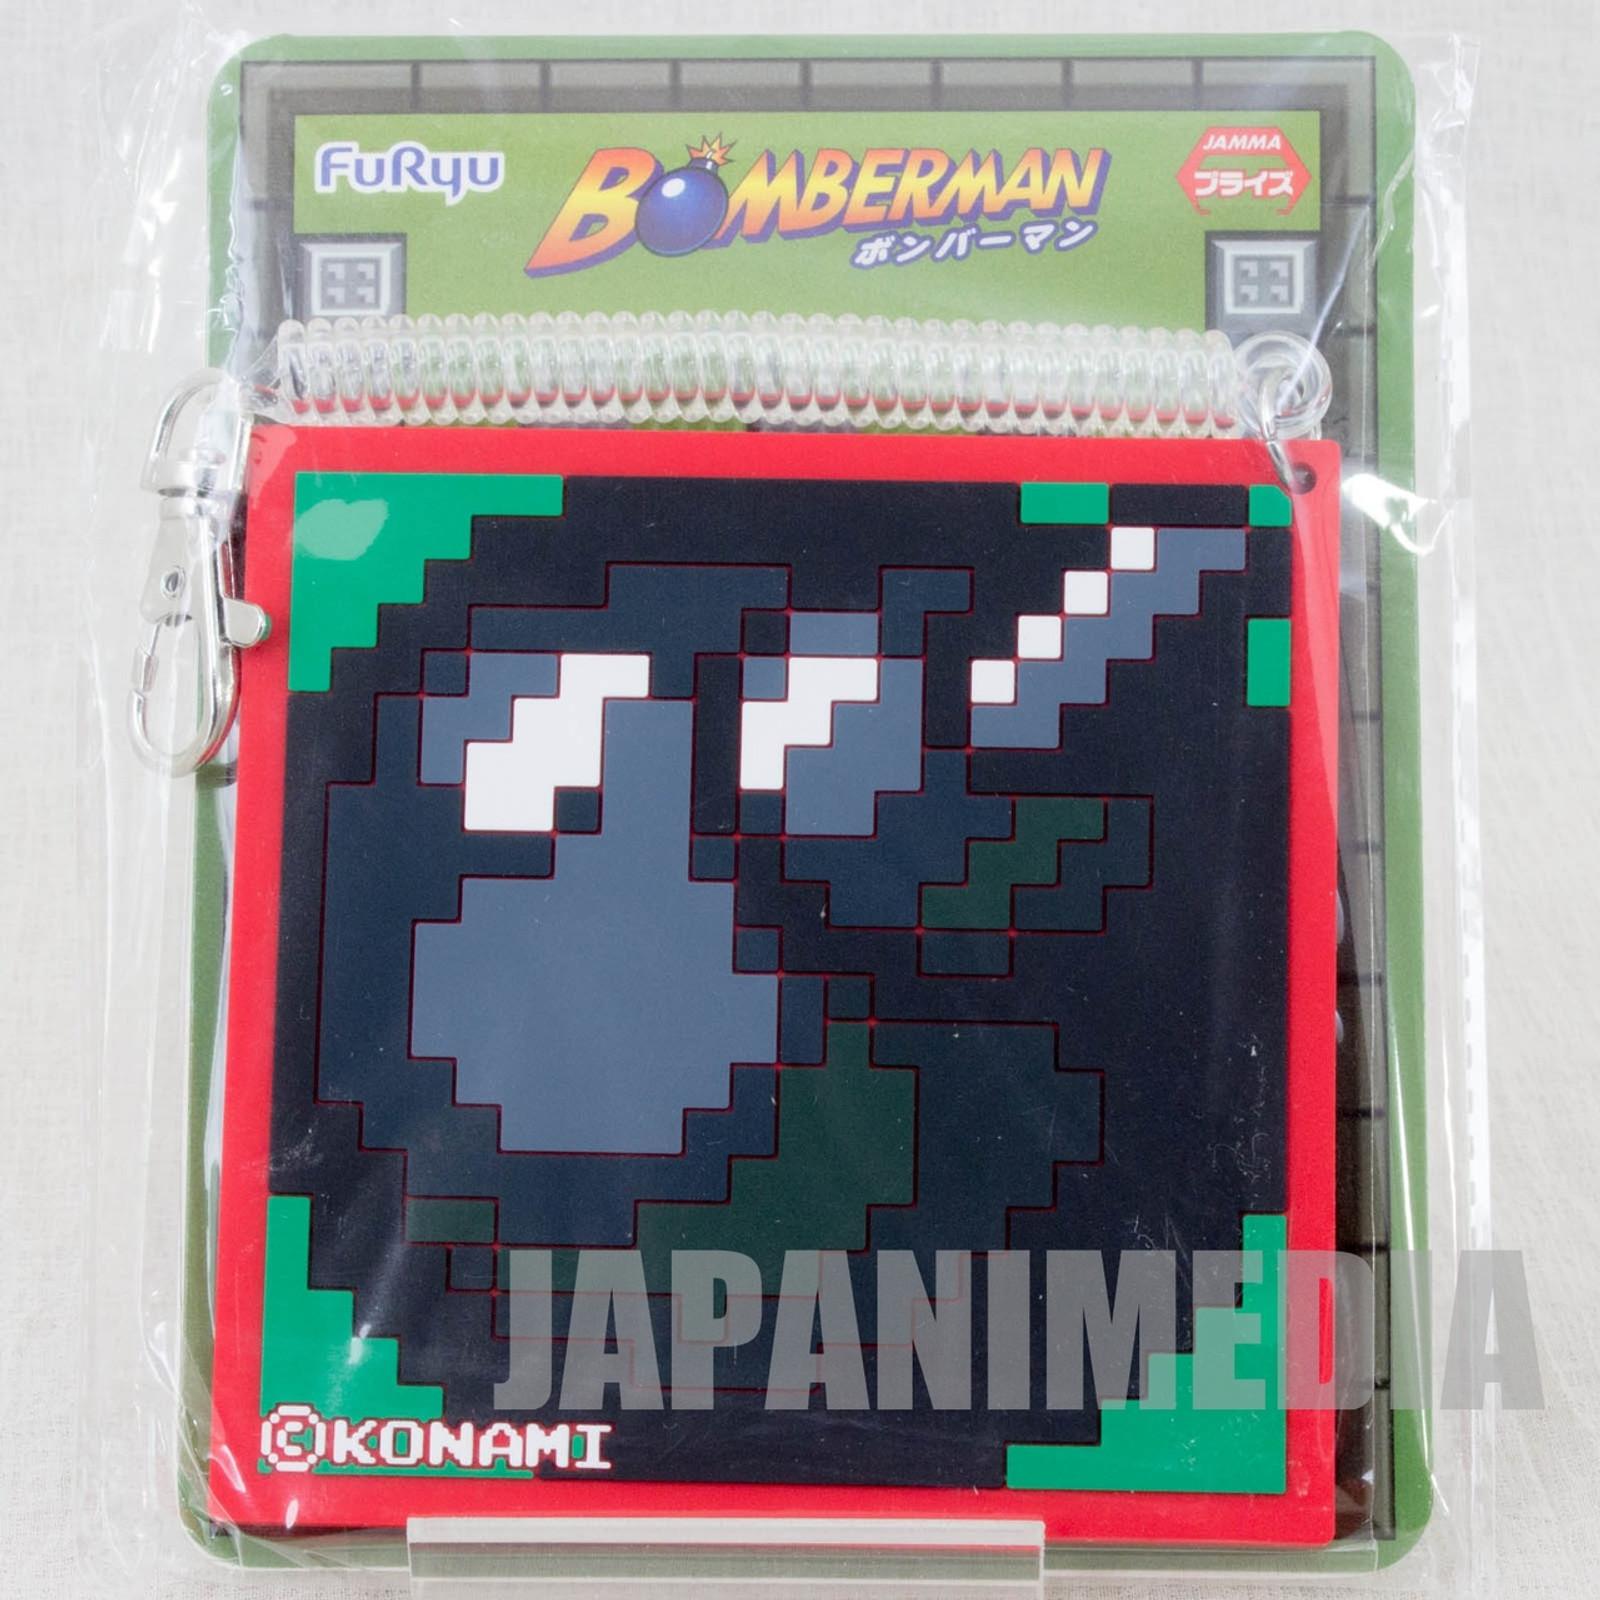 Bomber Man Bomb Up Rubber Pass Case Furyu Nintendo JAPAN NES Famicom